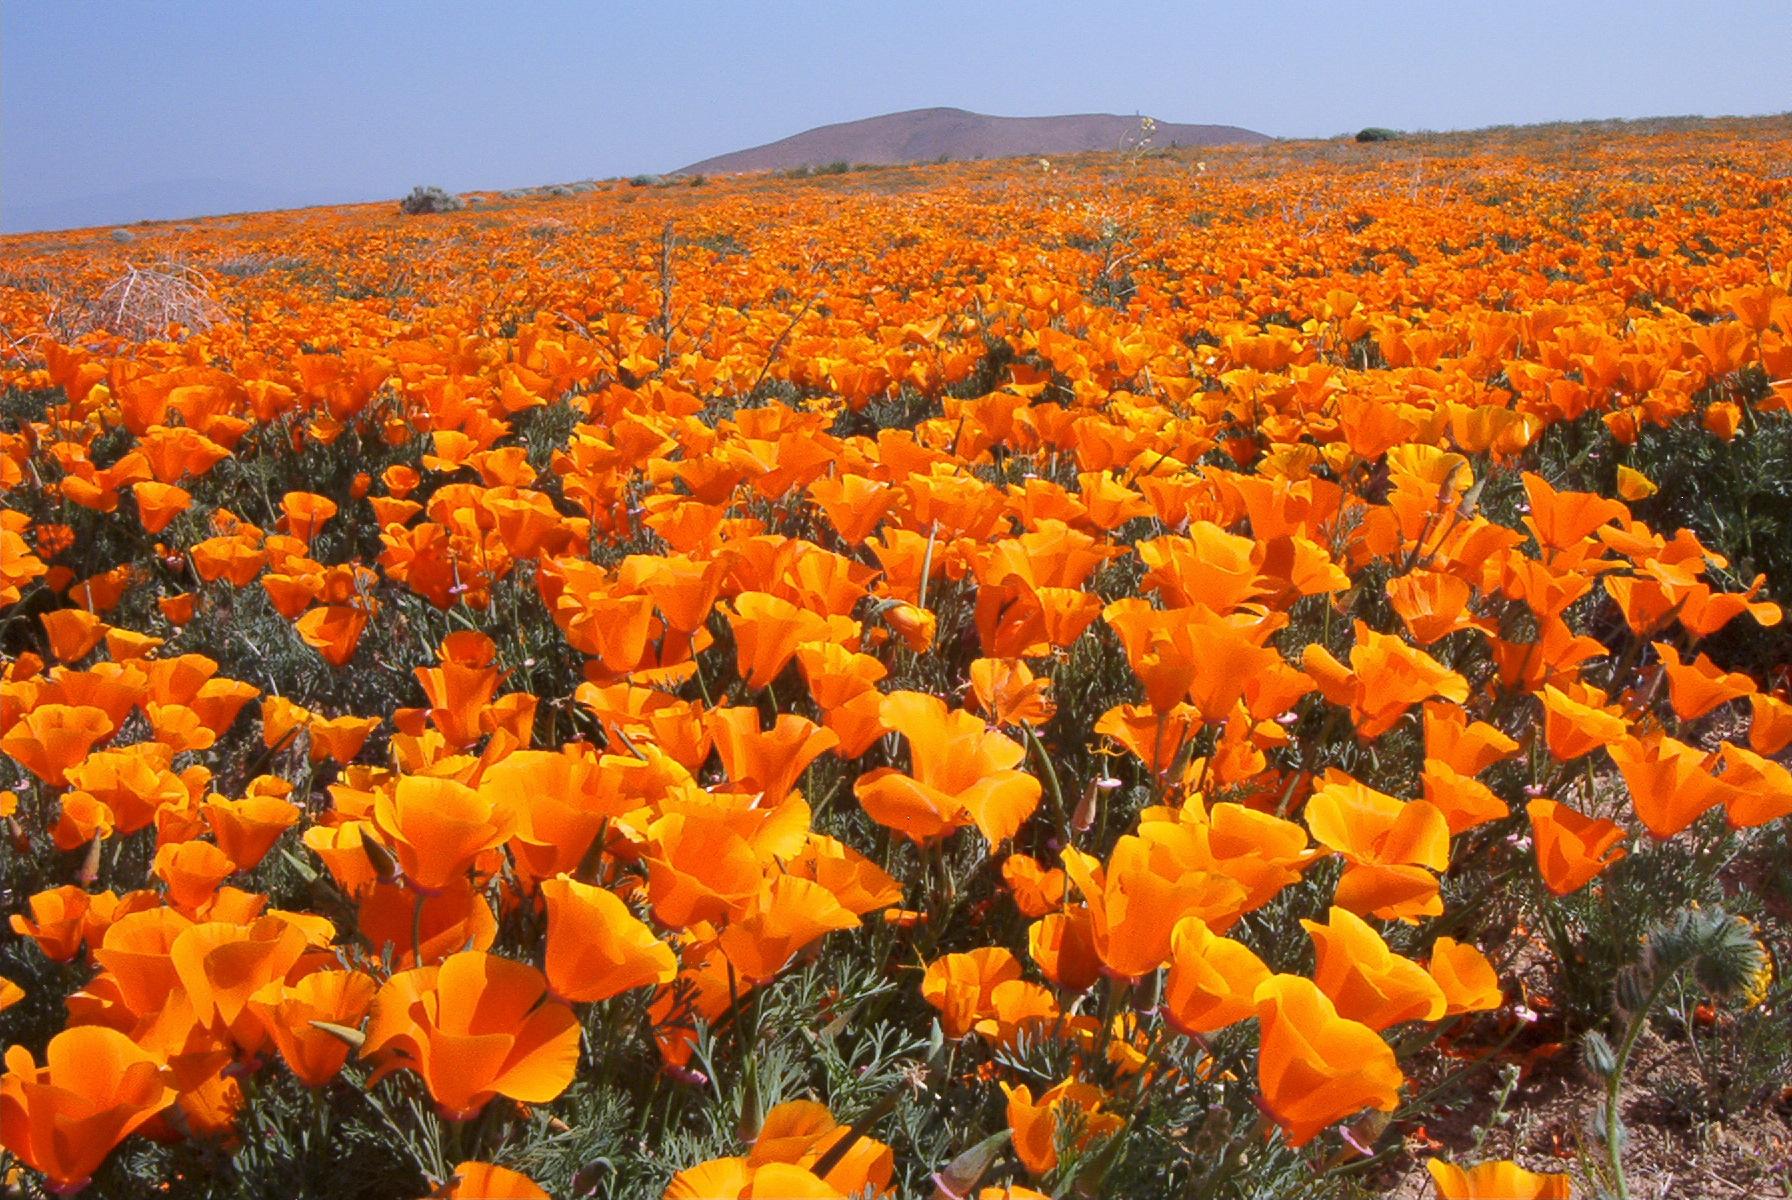 Antelope Valley Poppy Reserve에 대한 이미지 검색결과